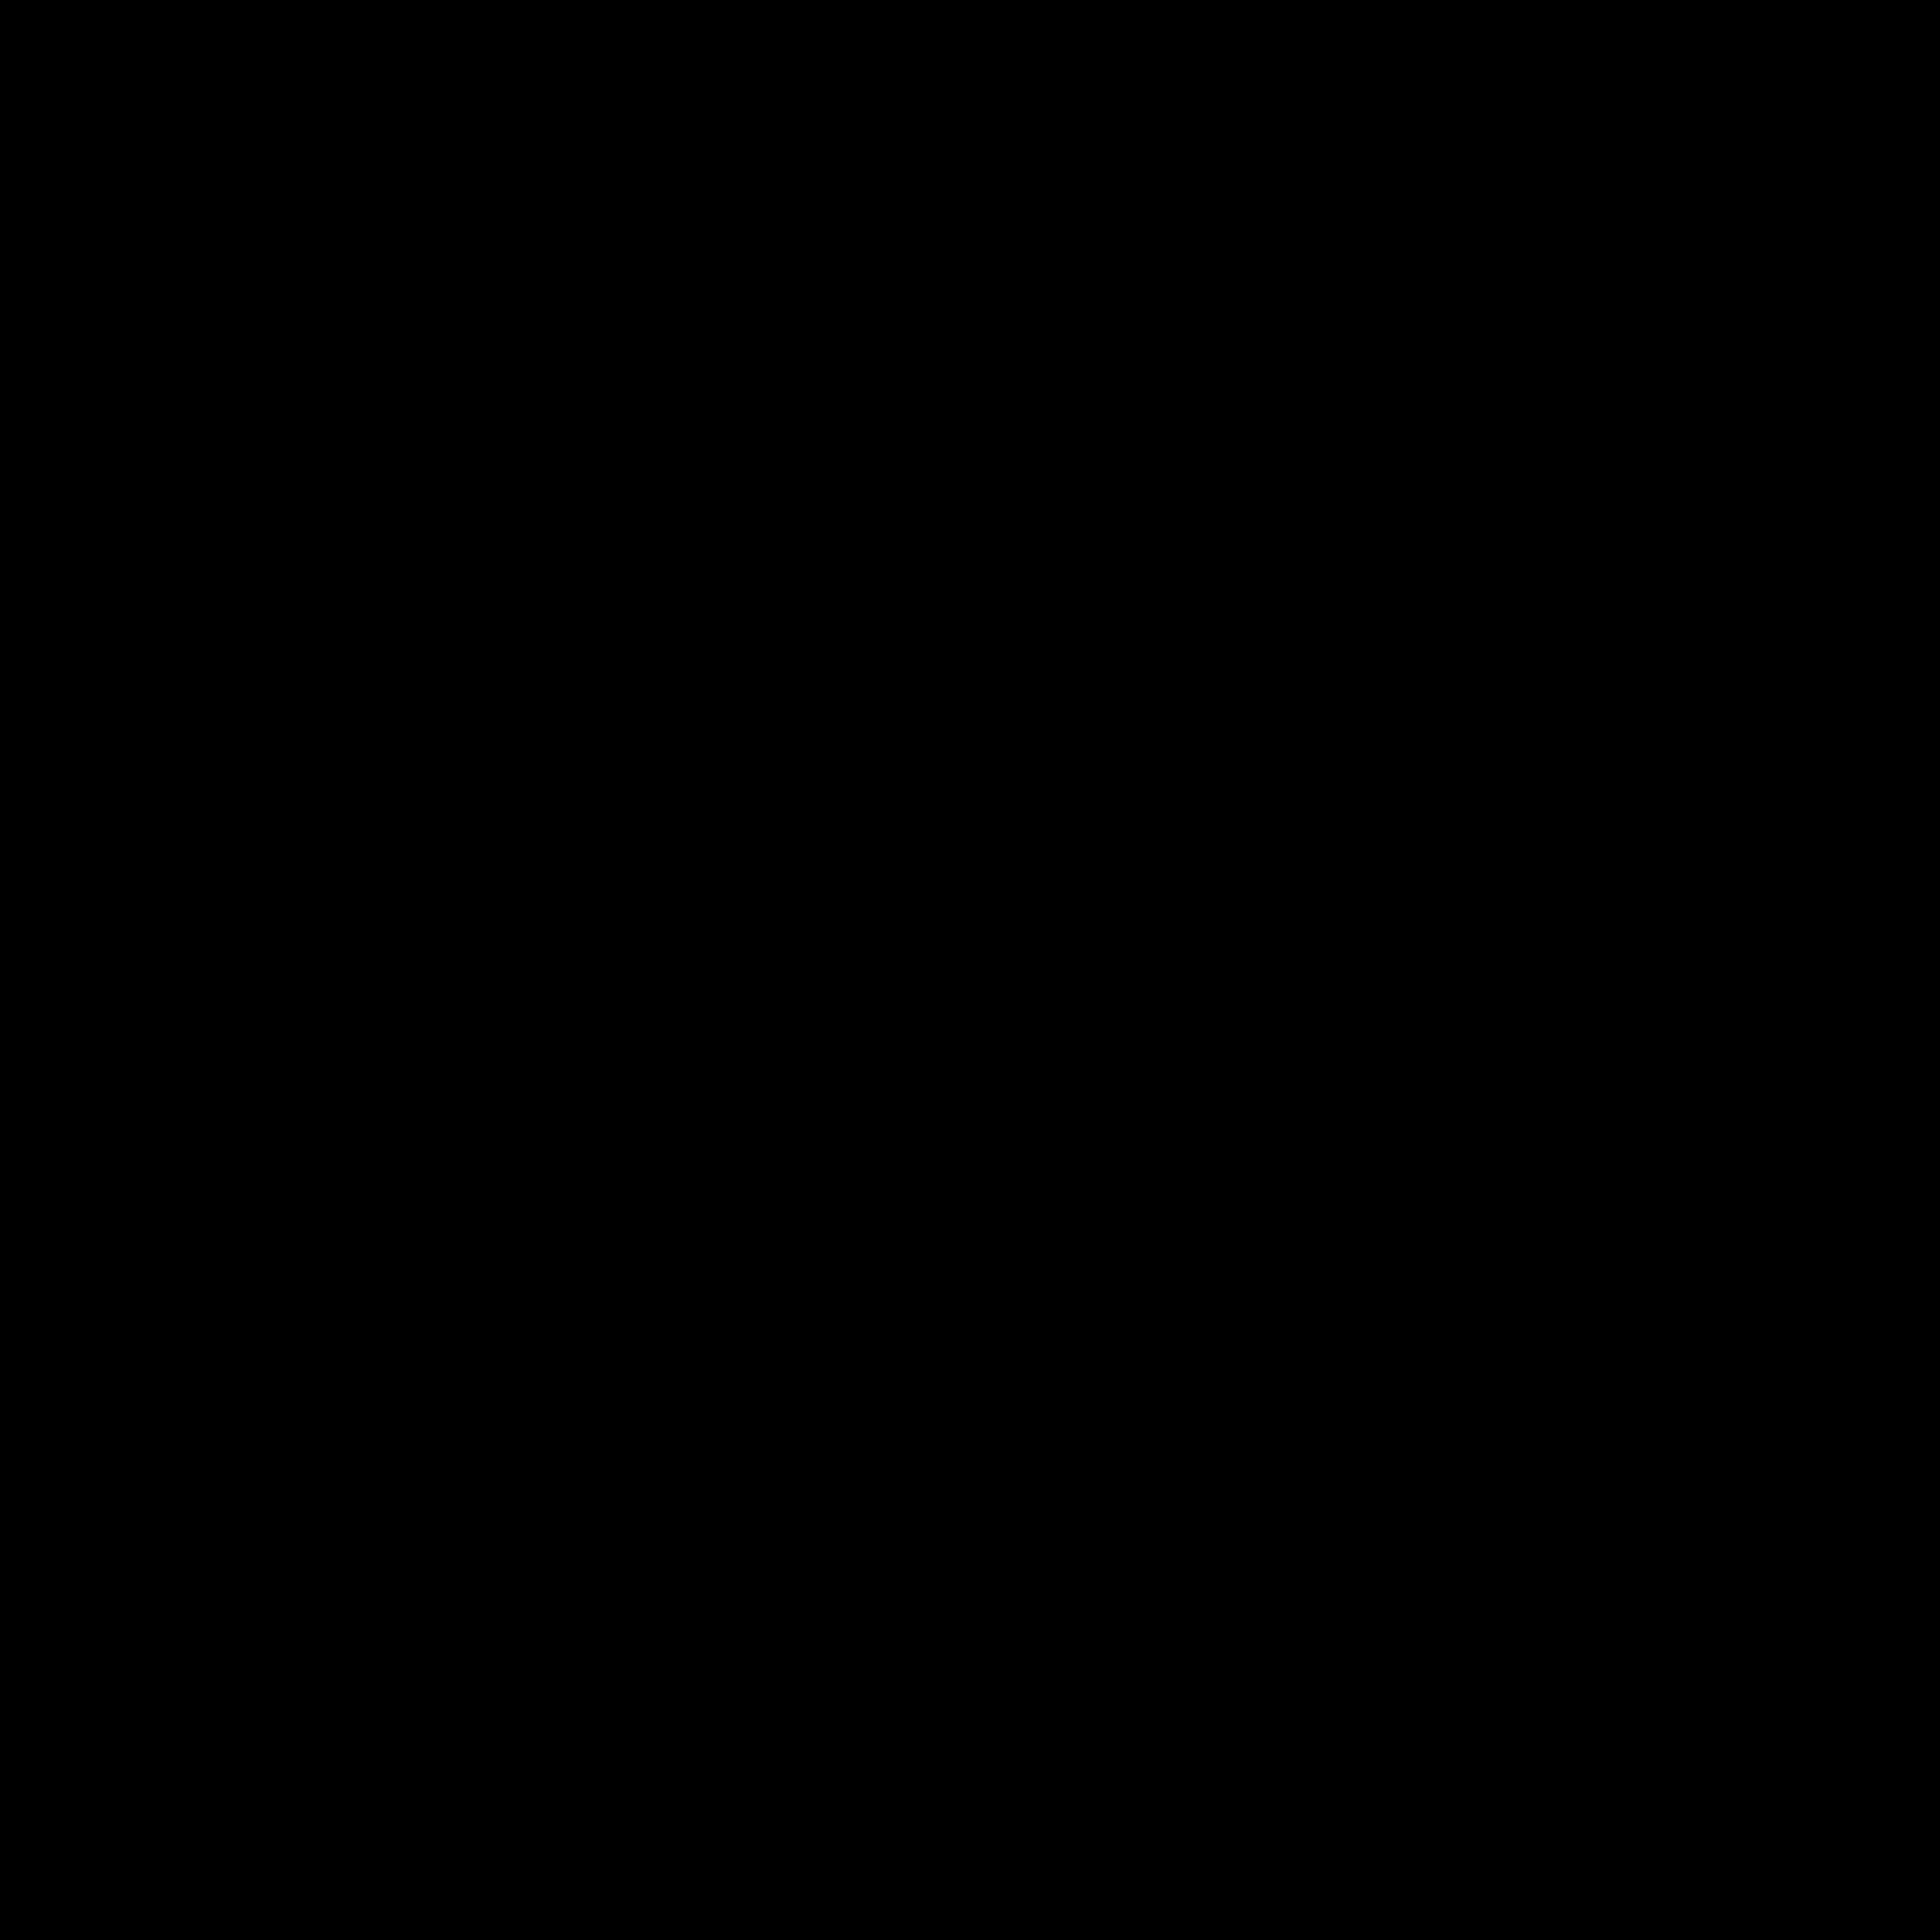 Flower of life png. Clipart symbol big image